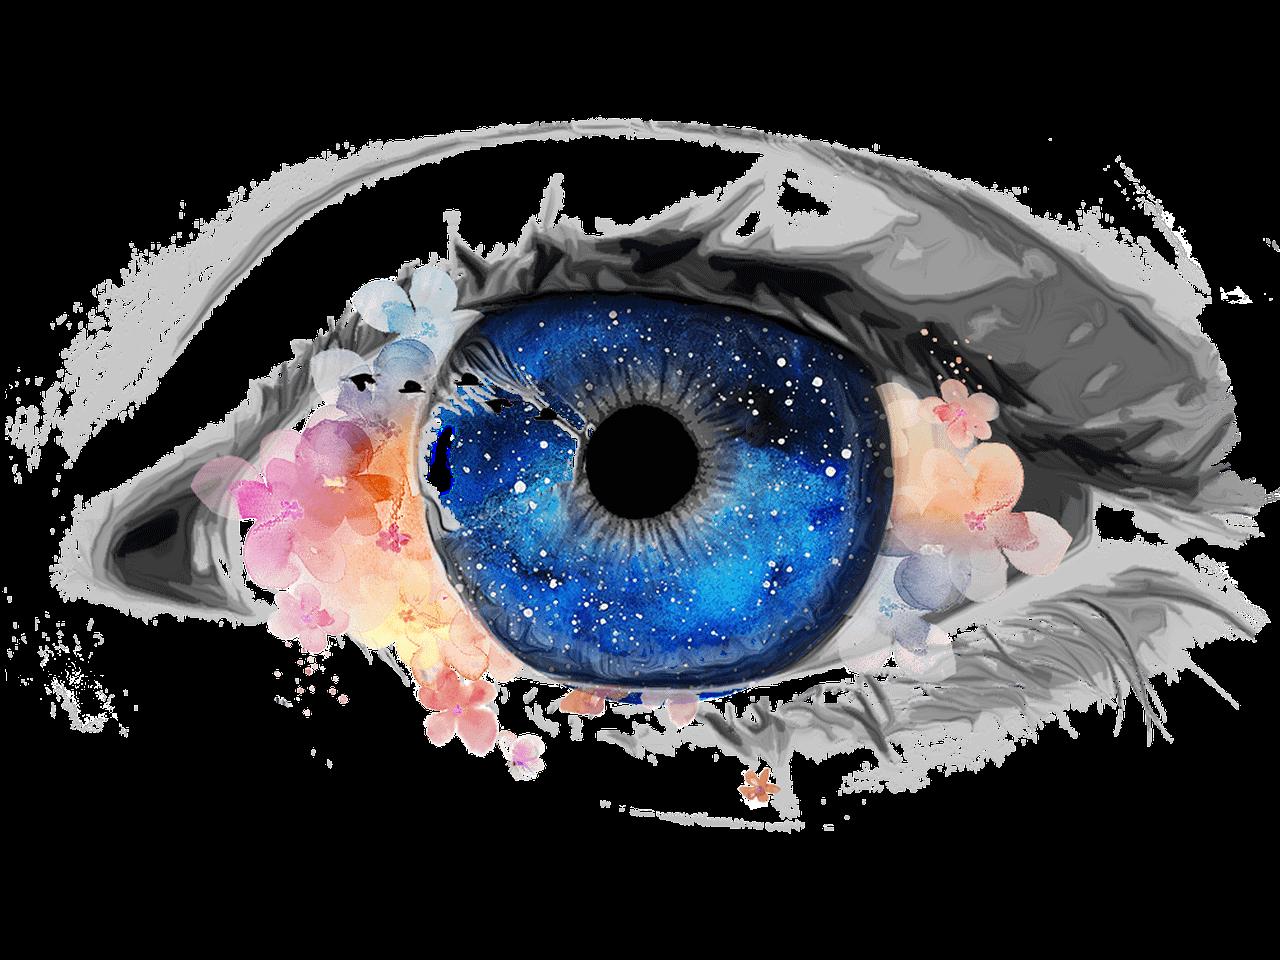 eye, creative, galaxy